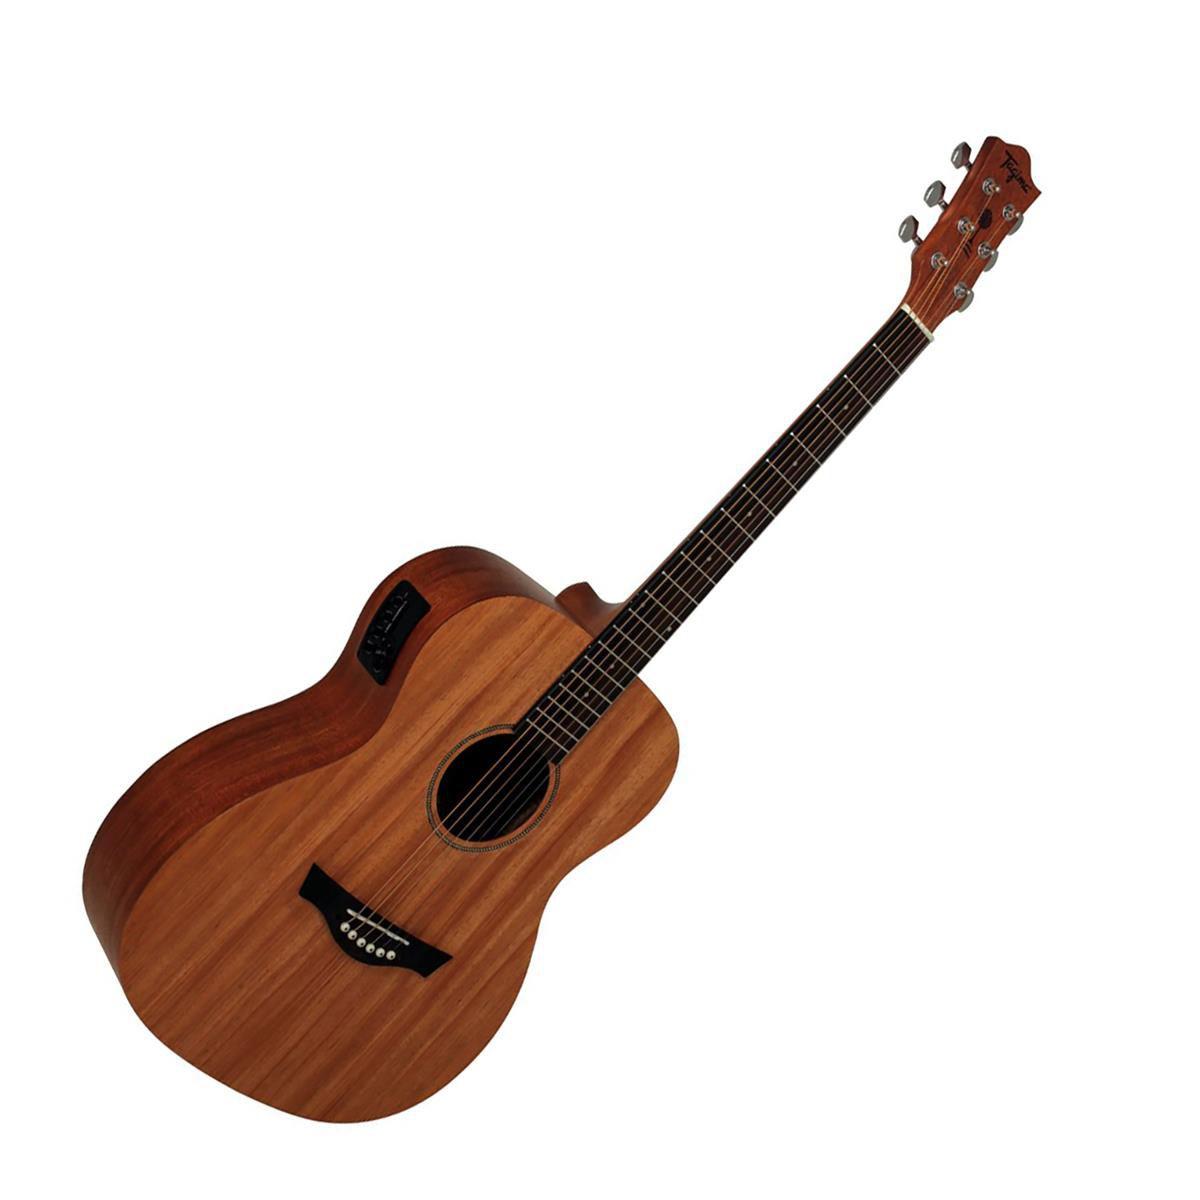 Violao Tagima Montana Tuner Mahogany  - Luggi Instrumentos Musicais